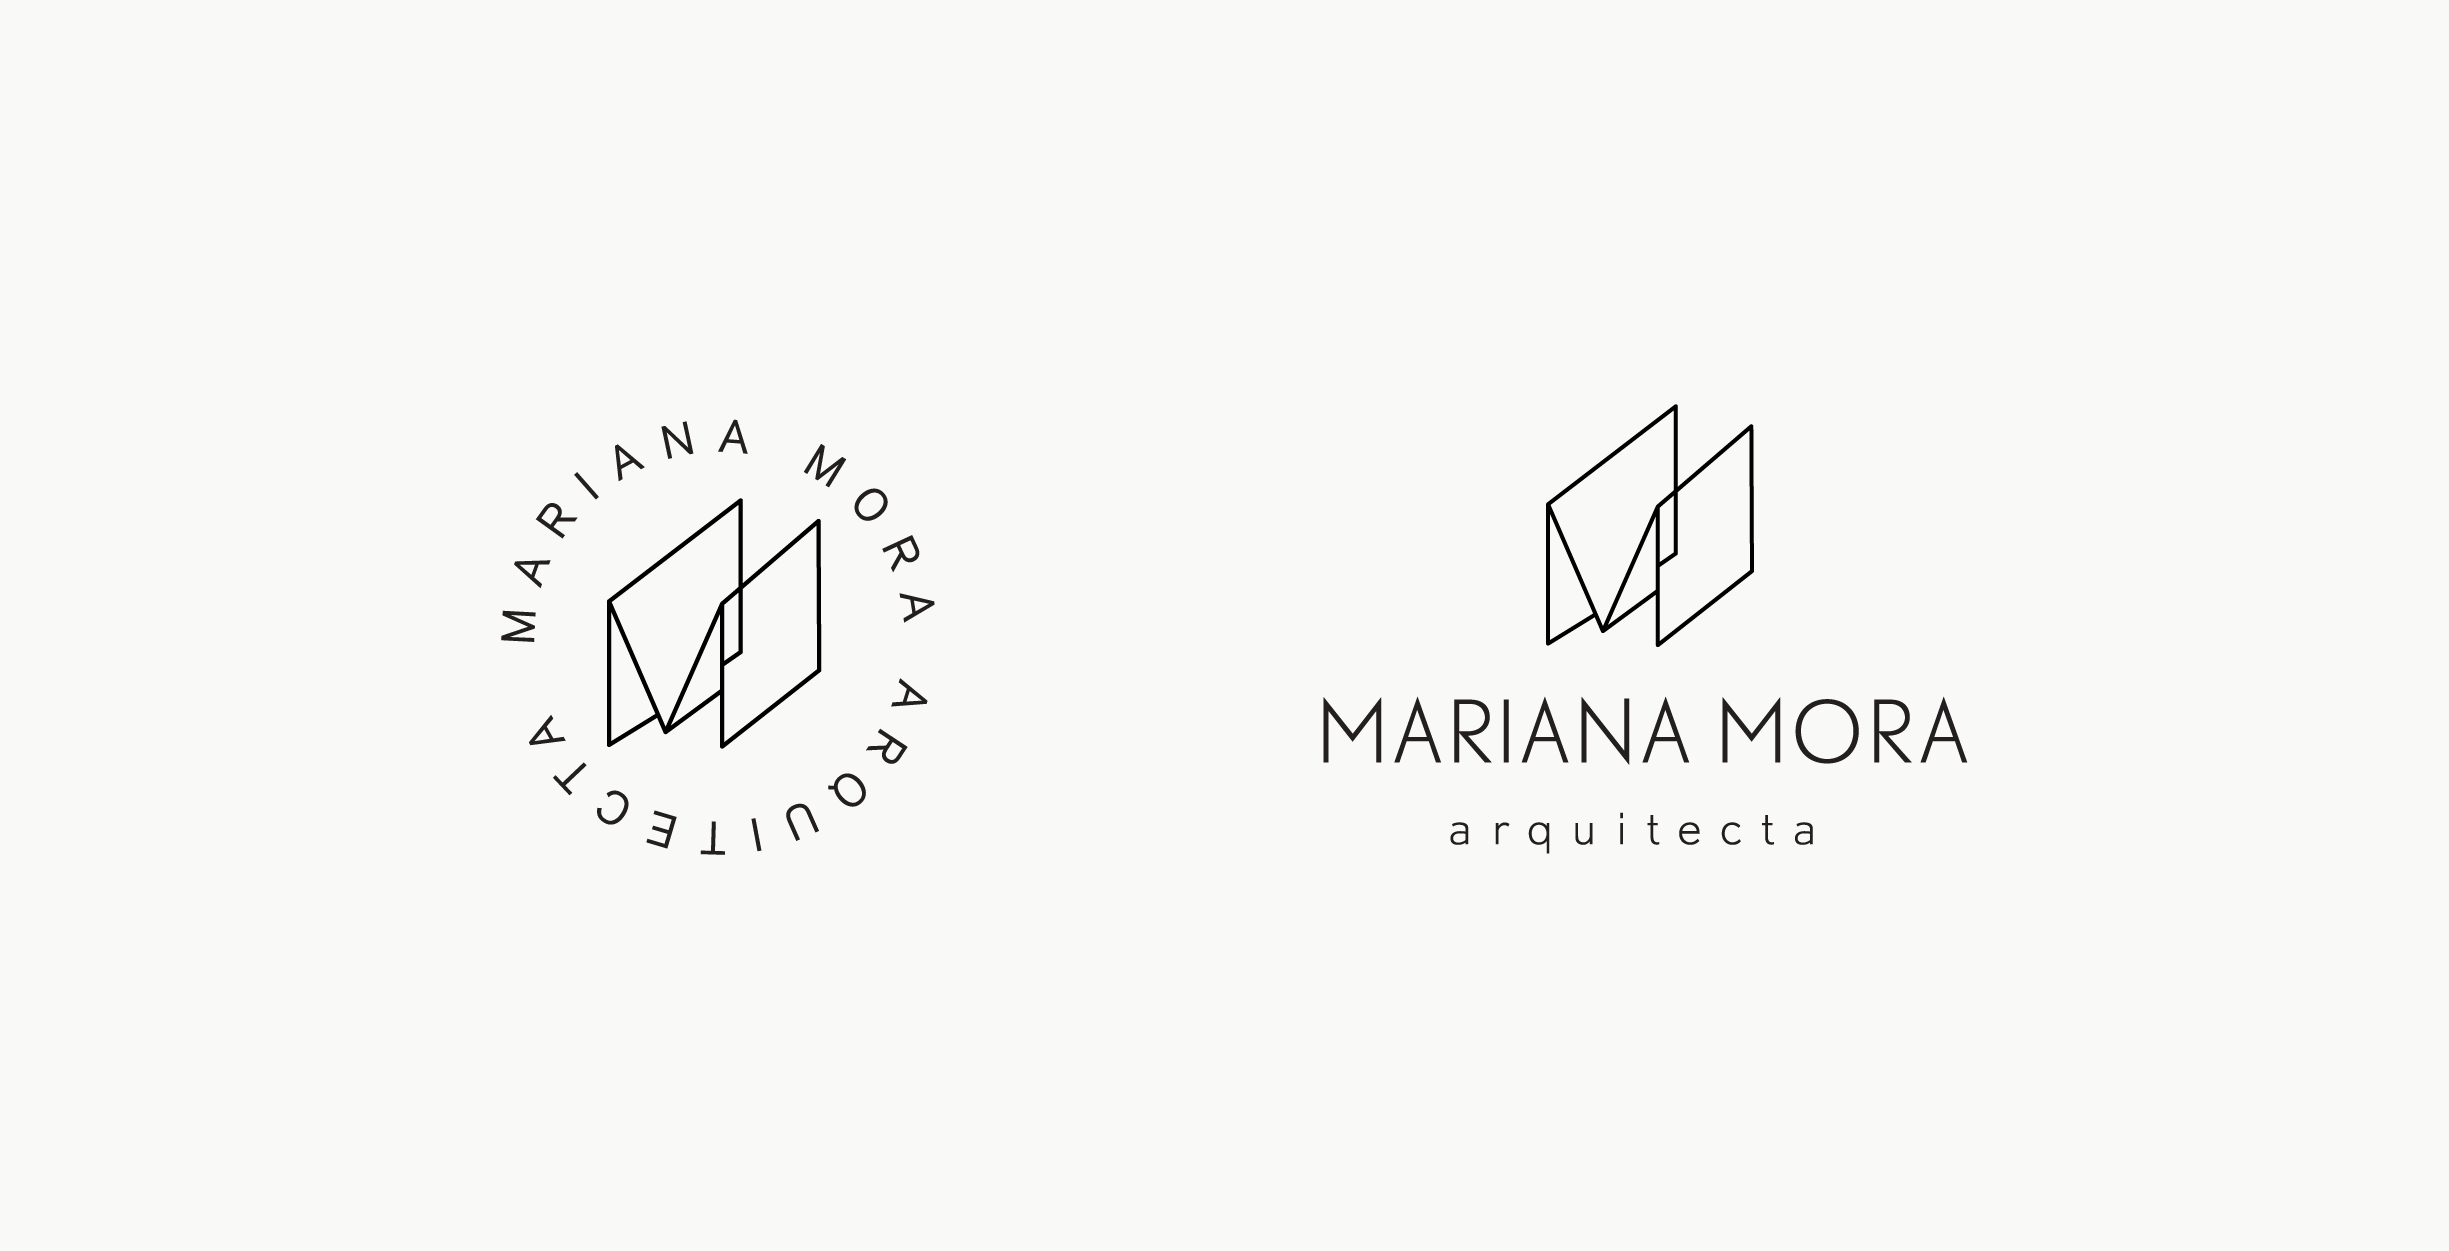 logos-2-v4-19